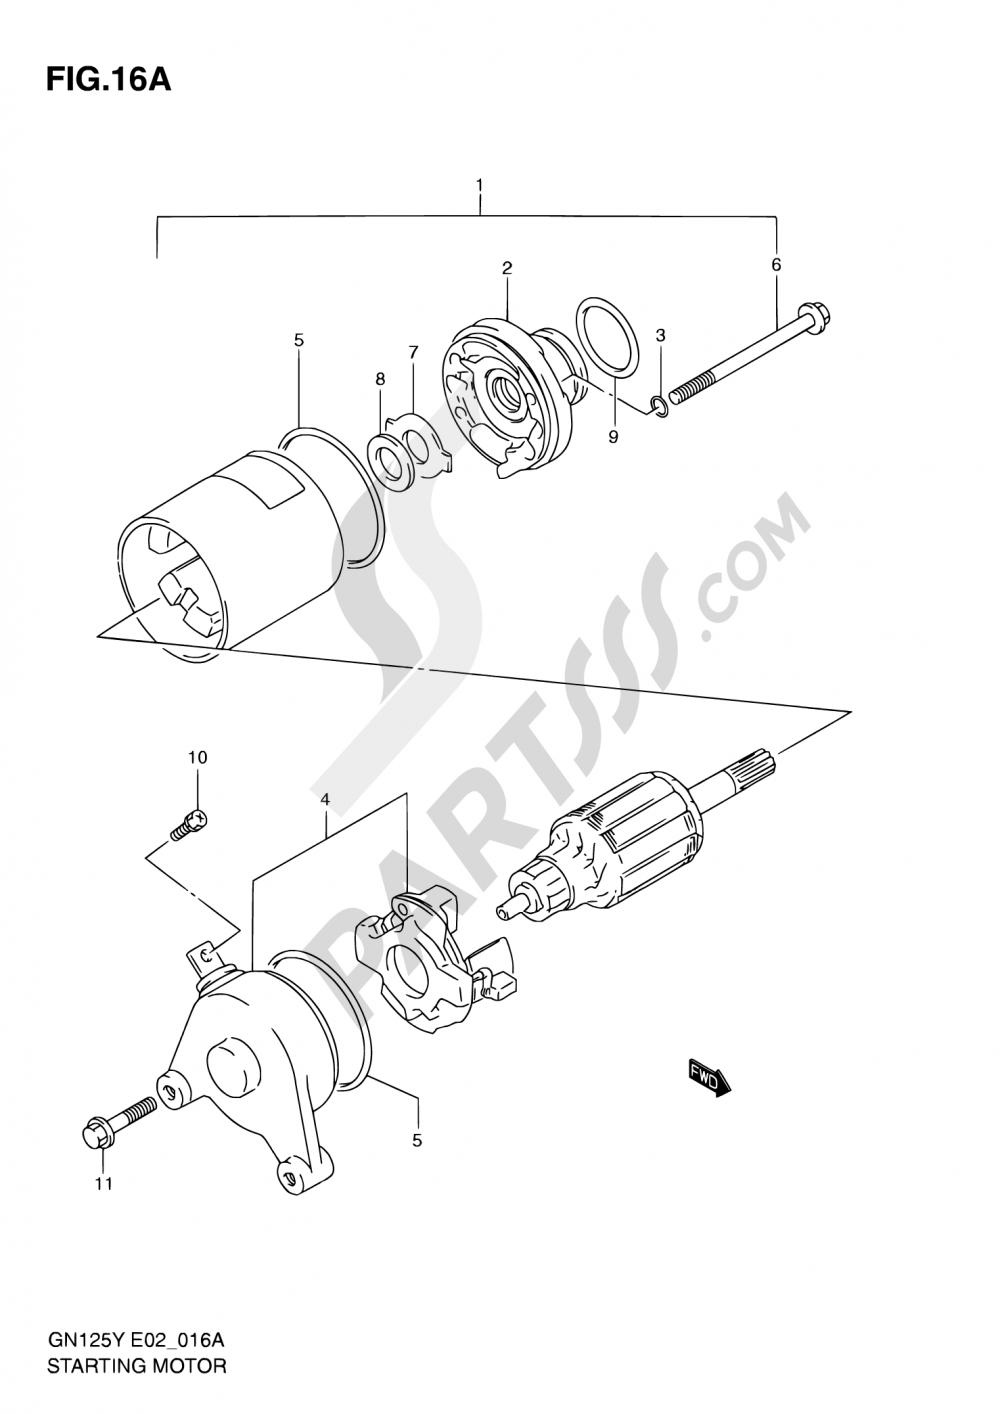 16A - STARTING MOTOR (MODEL K1) Suzuki GN125 2001